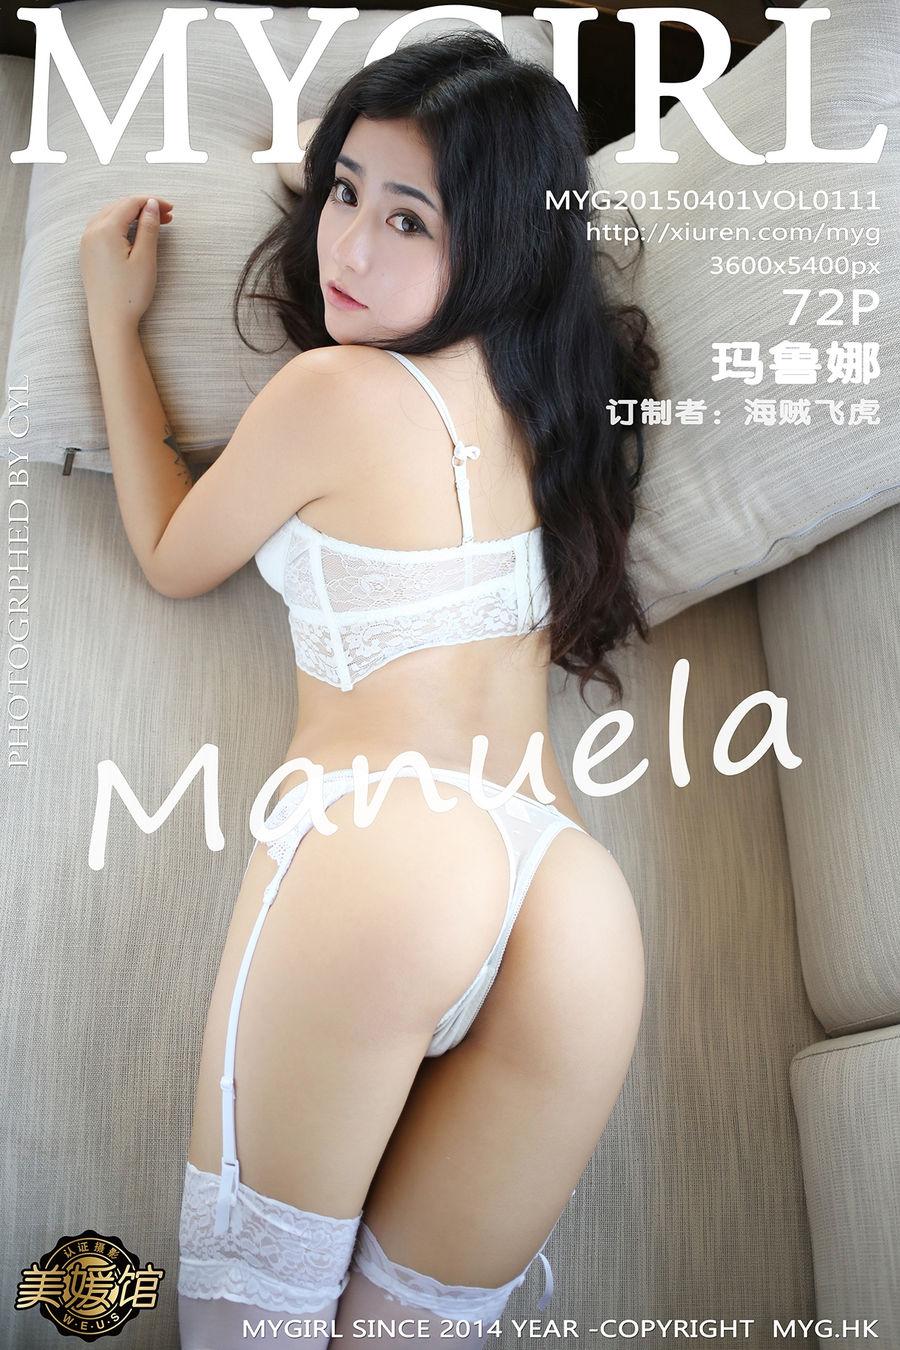 [MyGirl美媛馆] VOL.111 Manuela玛鲁娜 [73P/175M]